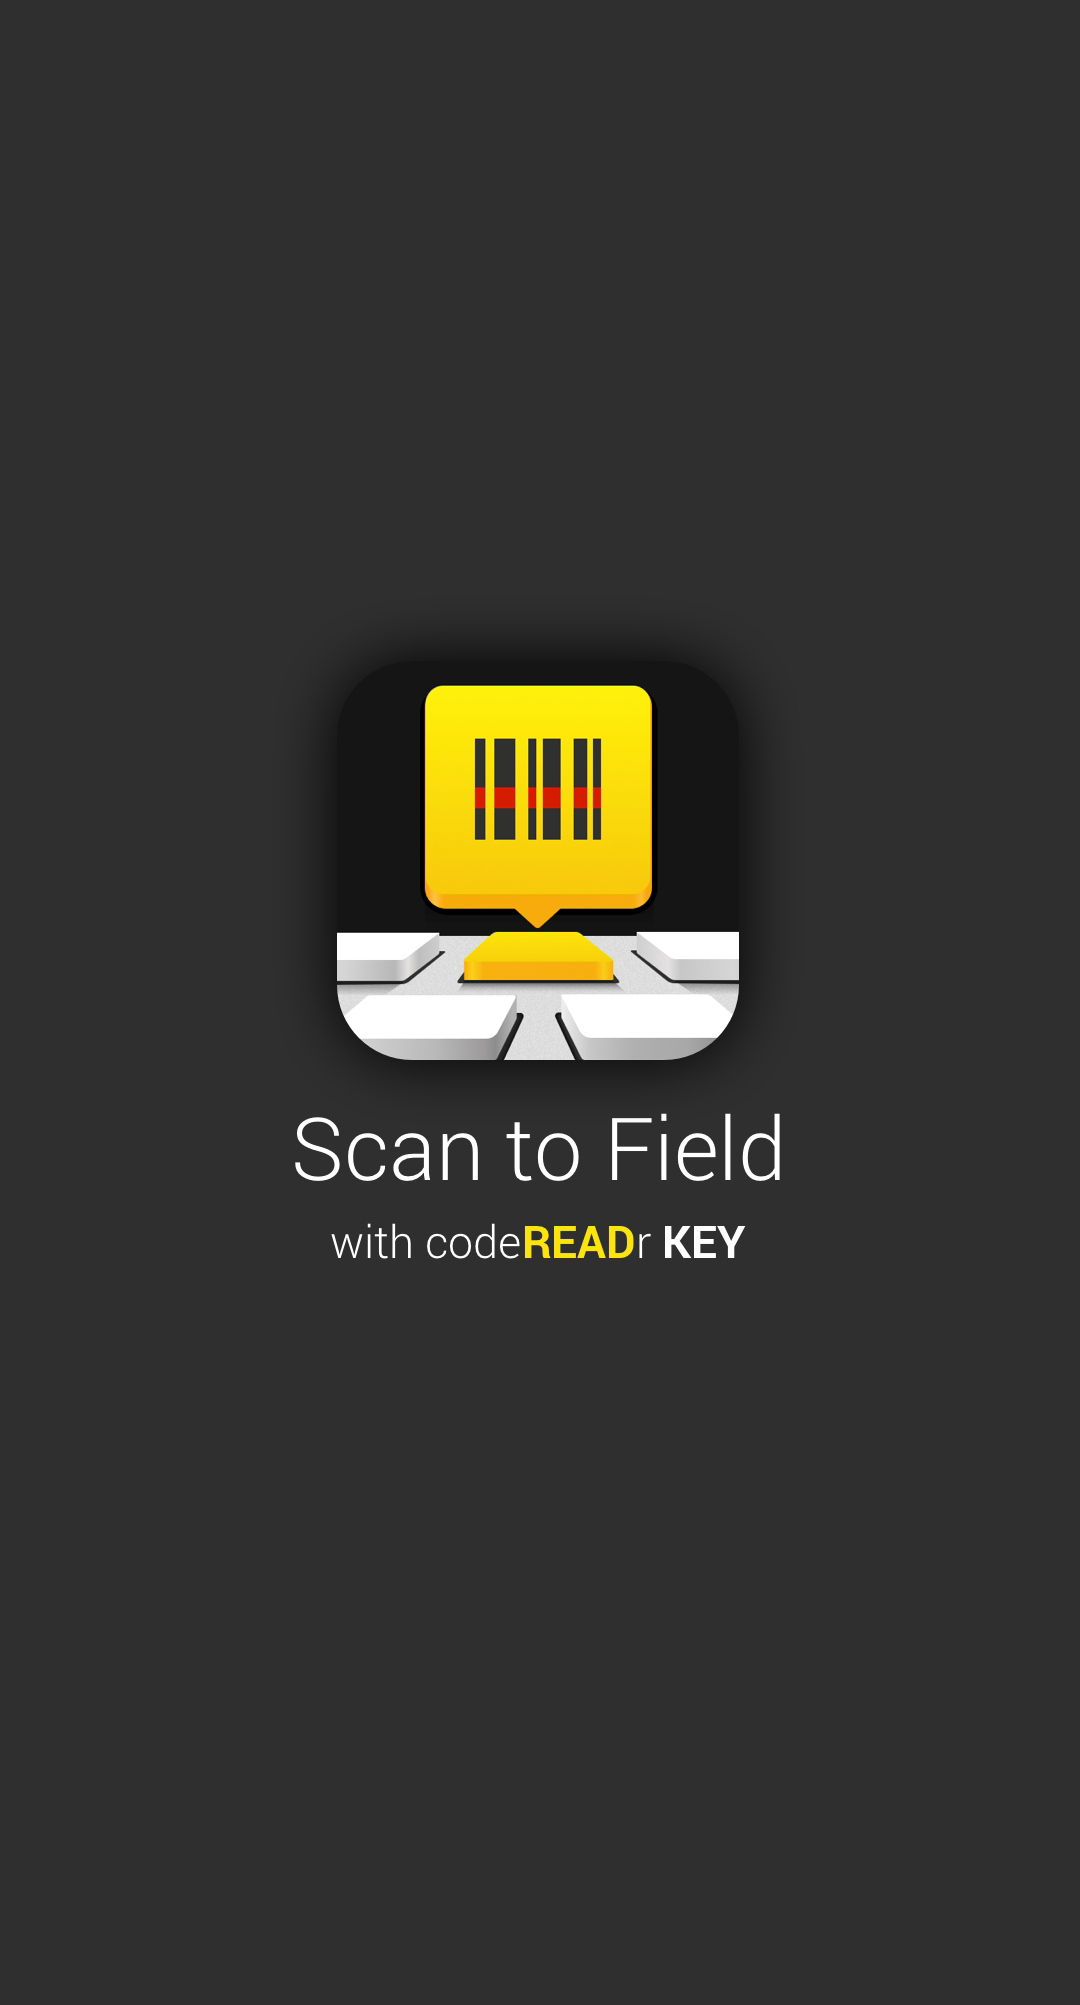 codereadr key splash screen